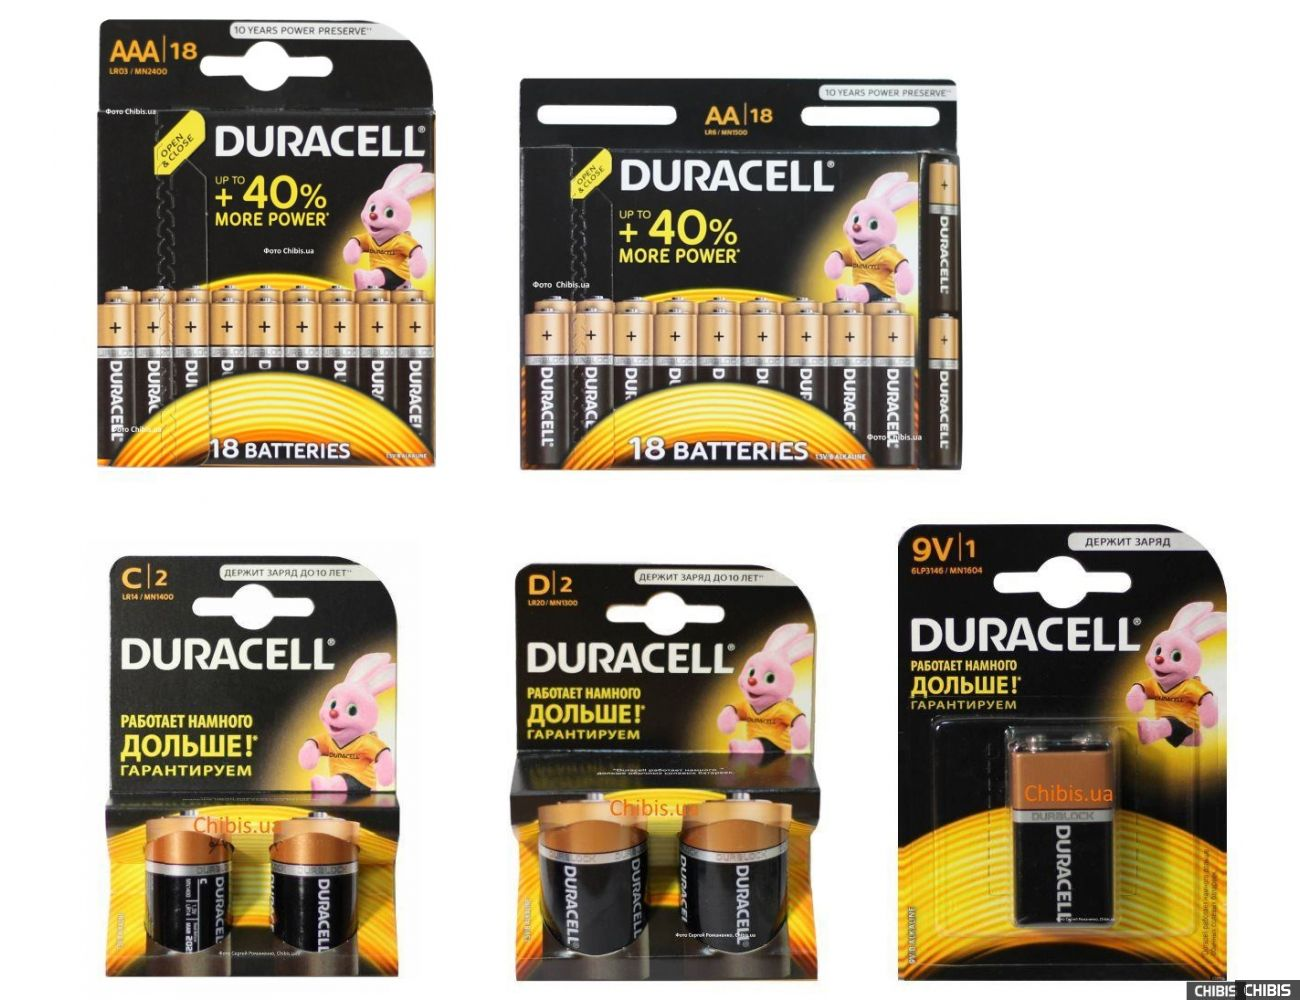 Комплект батареек Duracell Basic 1.5V AA / AAA / LR14 / LR20 / 9V